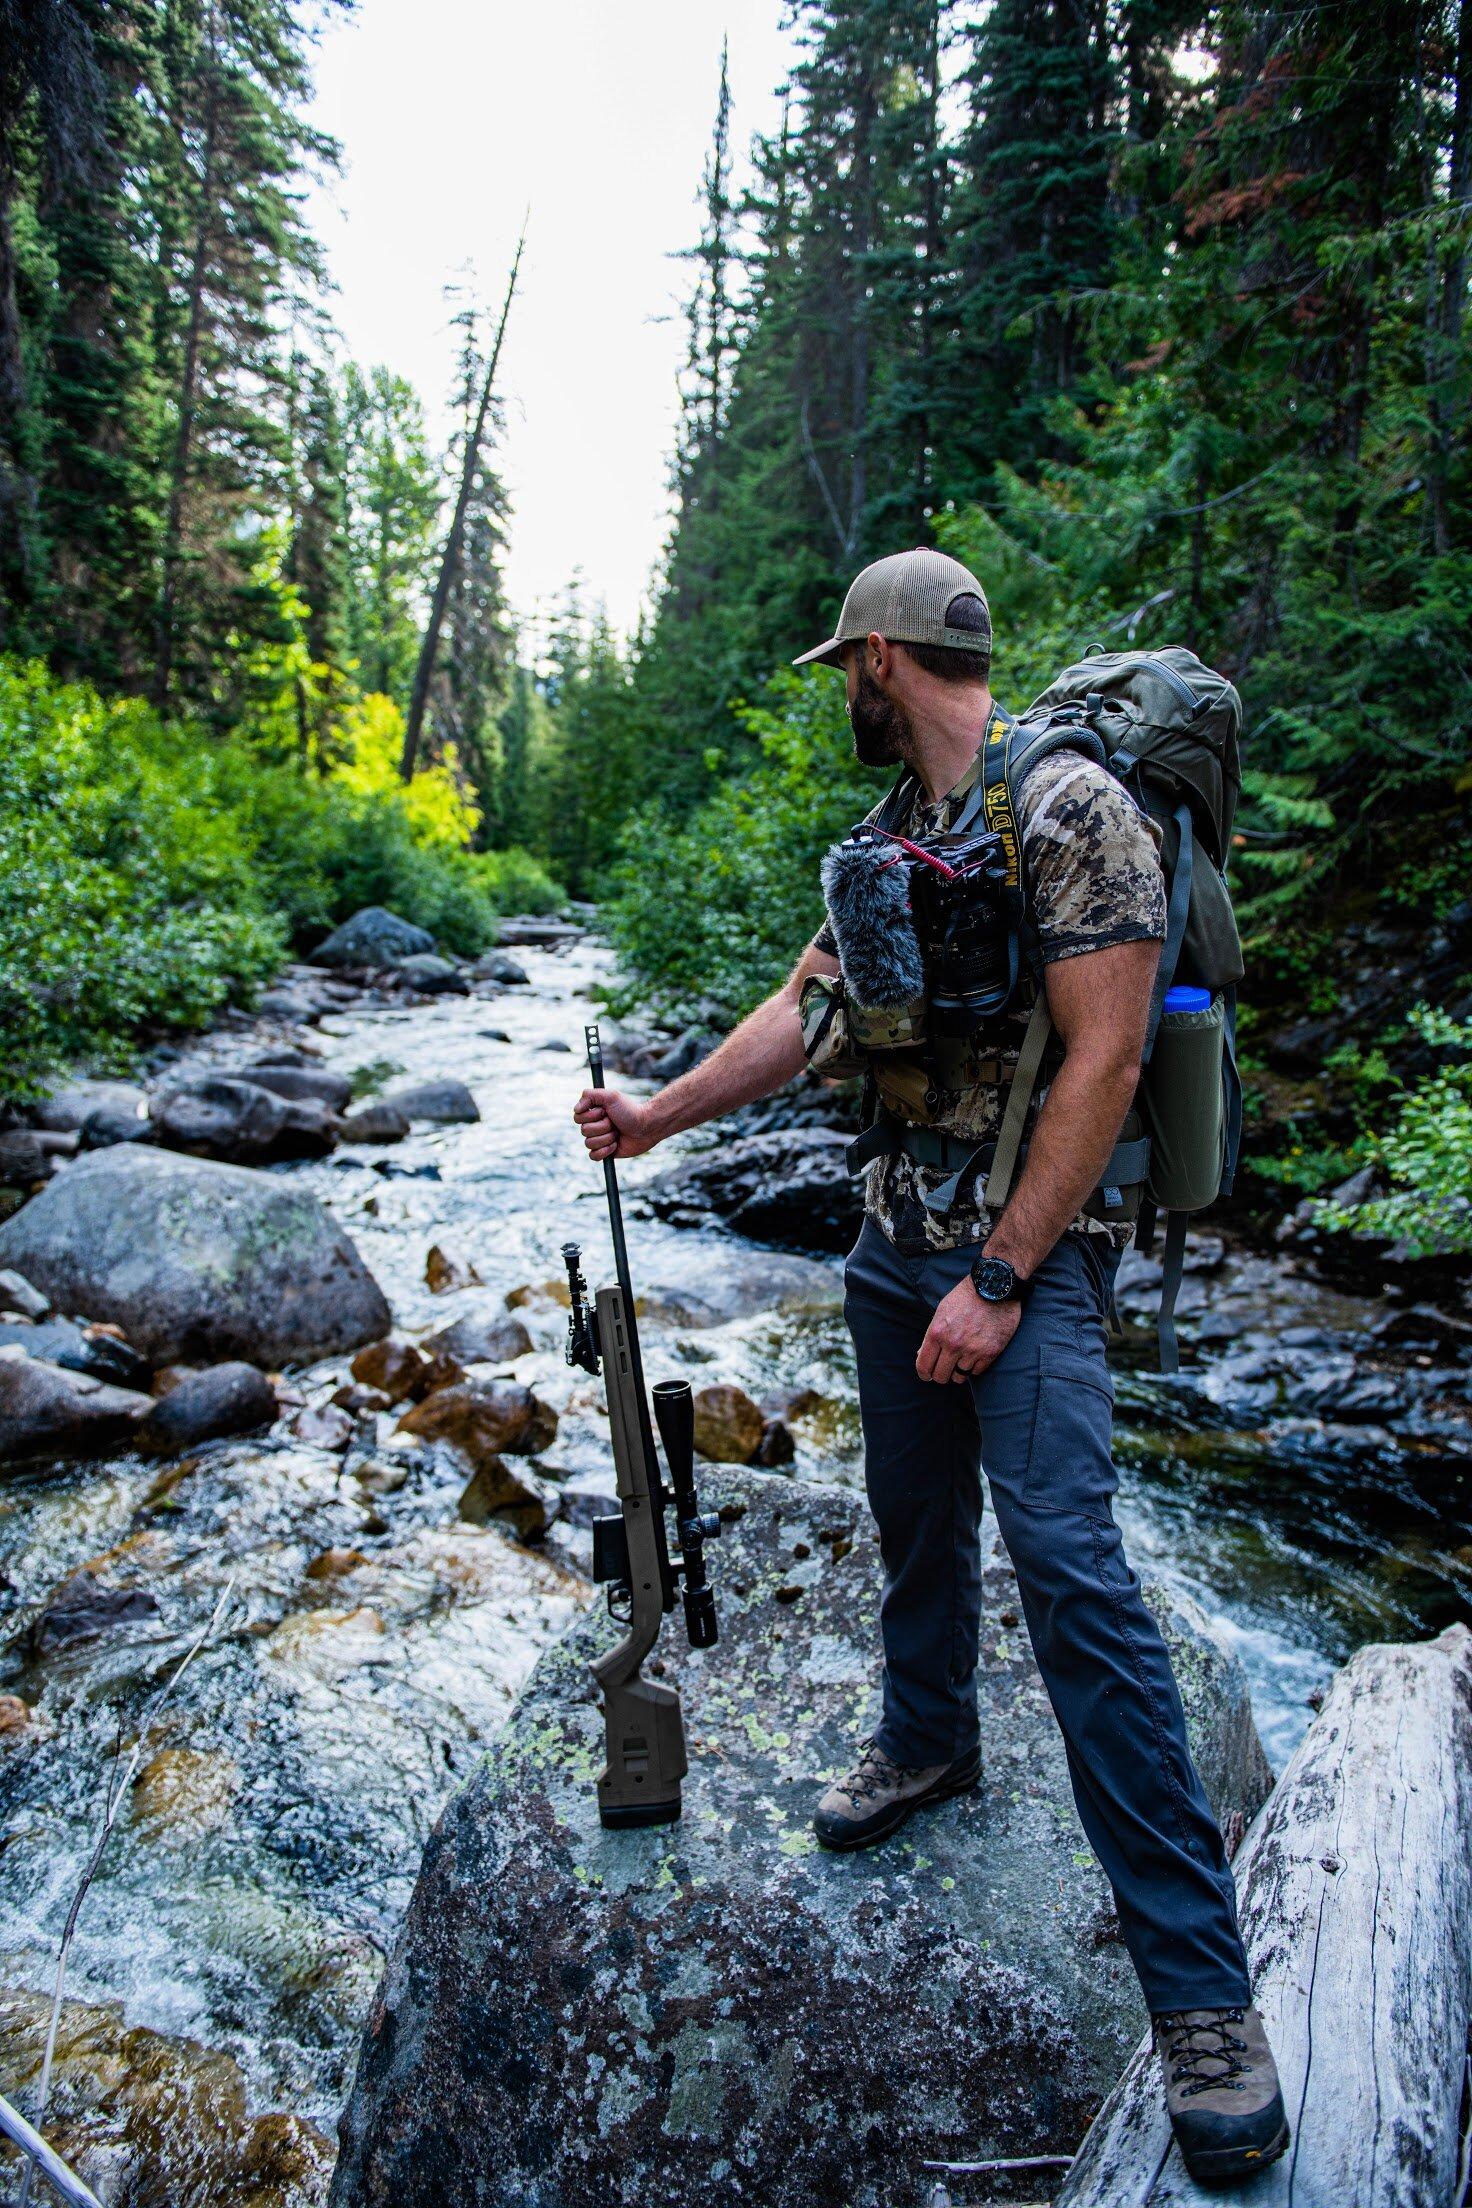 Zamberlan 960 Guide — Pacific North Wild